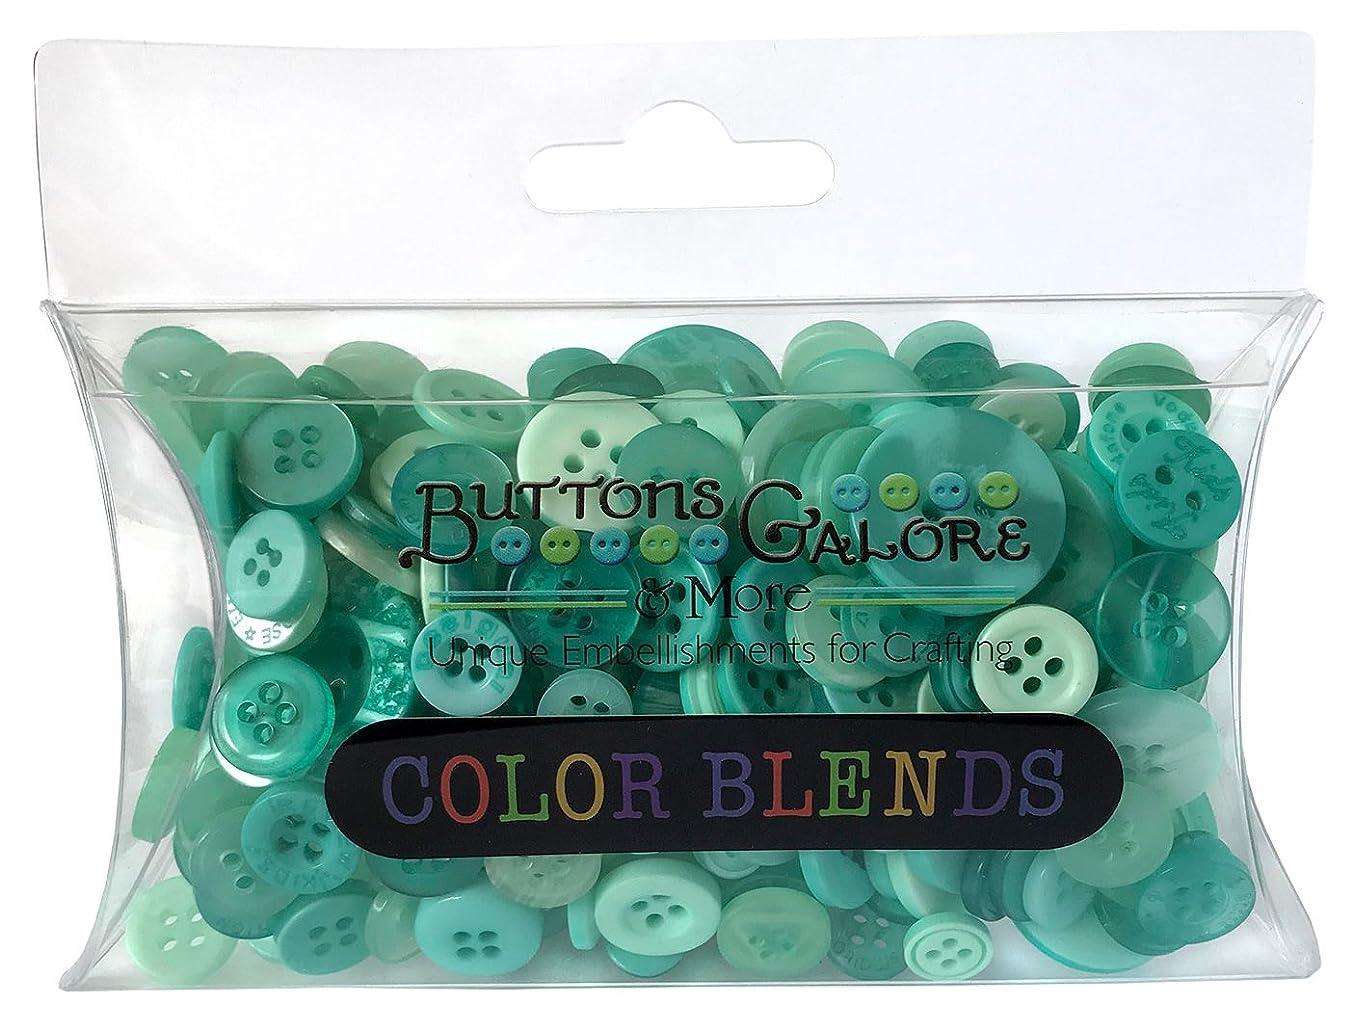 Buttons Galore CB112 Color Blend Buttons, 3-Ounce, Mint Color, 3 Shades of Mint Blue